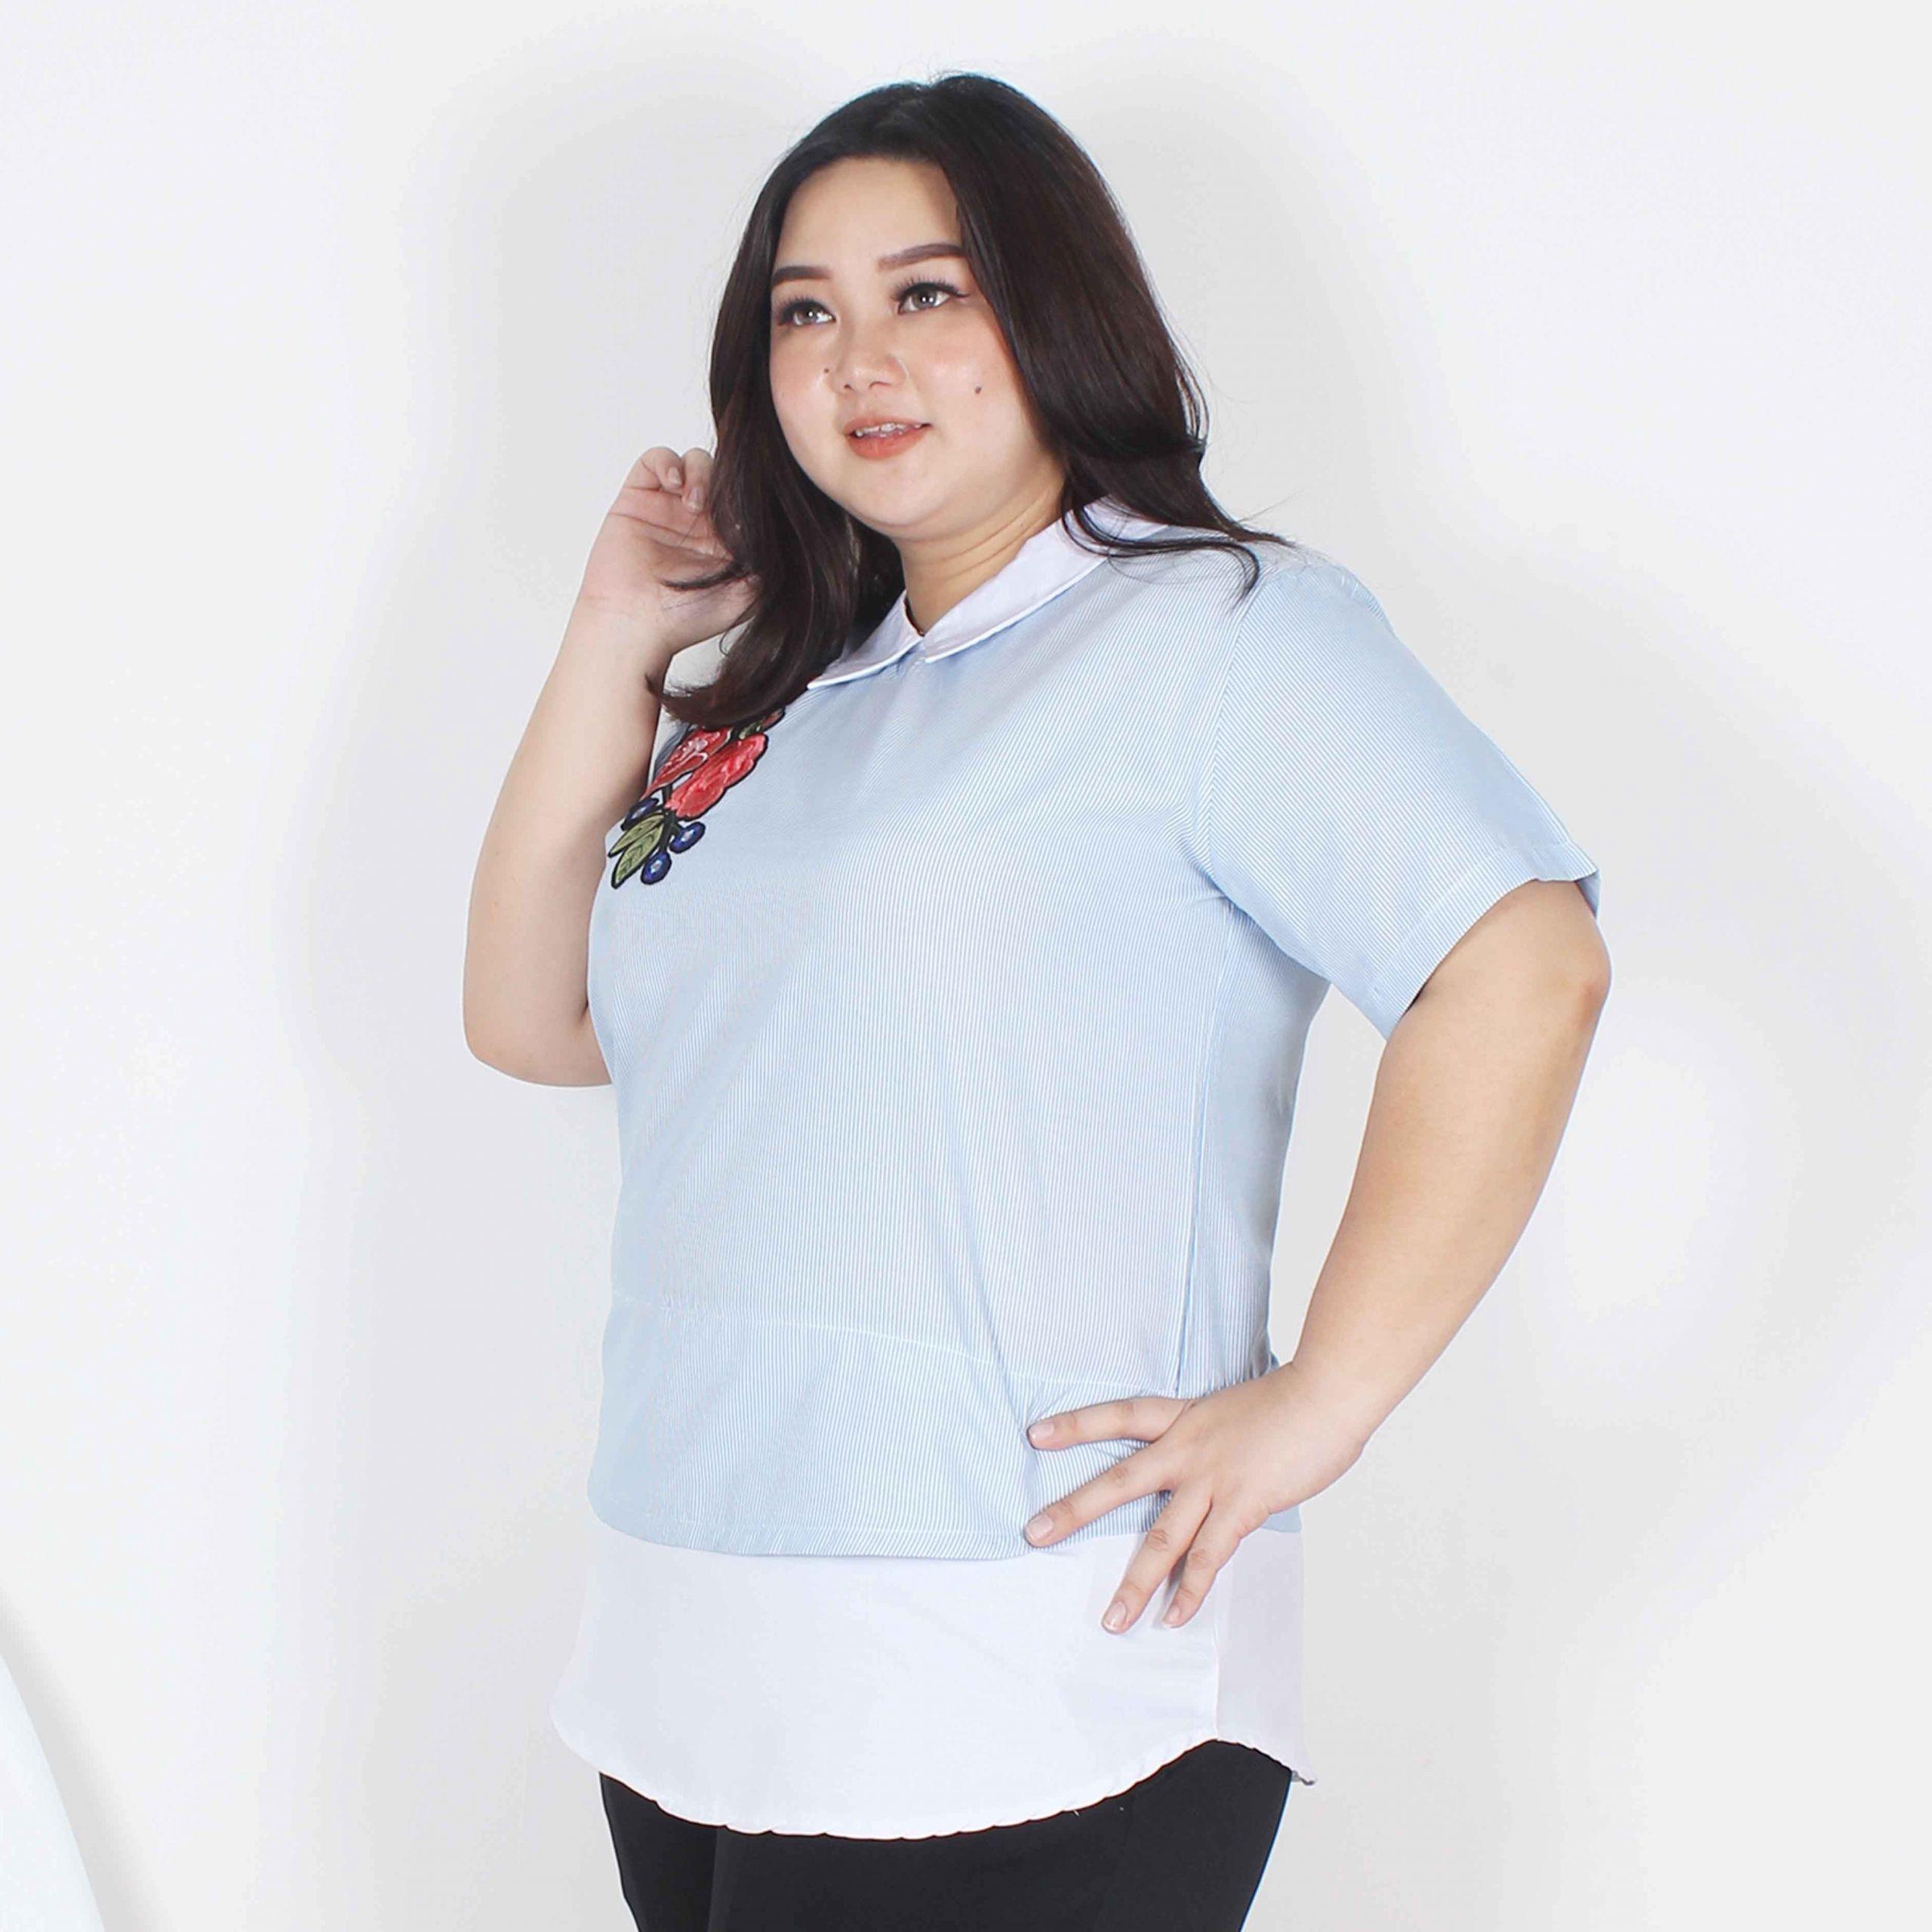 Model Baju Lebaran Big Size S1du Baju Big Size Bodybigsize 2